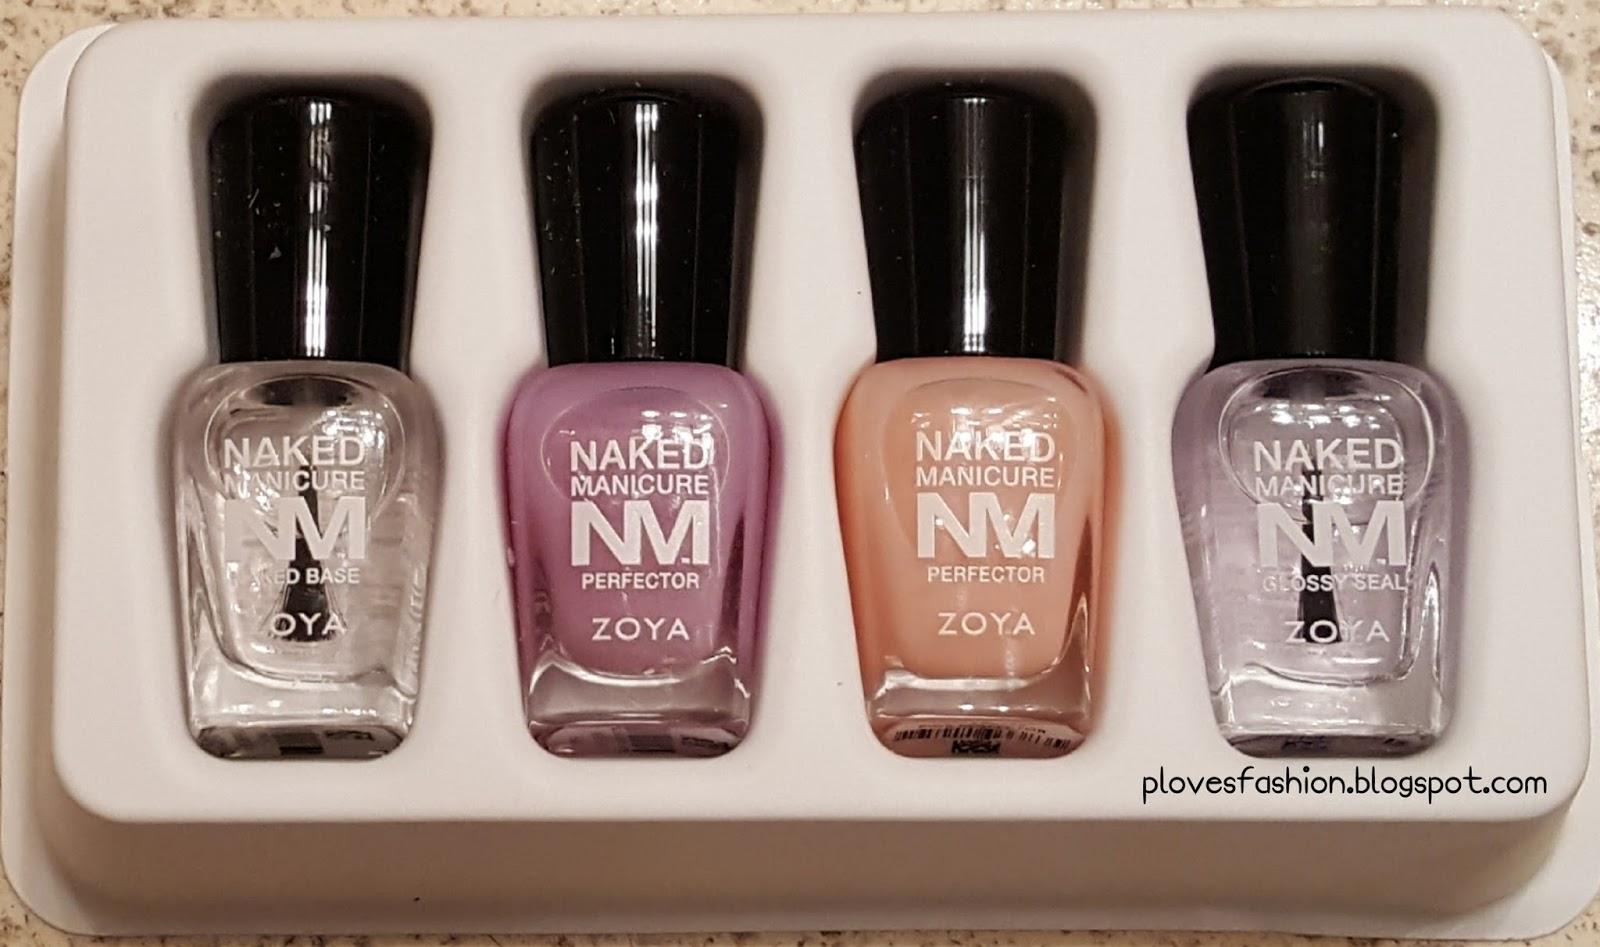 Beauty and More by Pilar : Zoya Naked Manicure